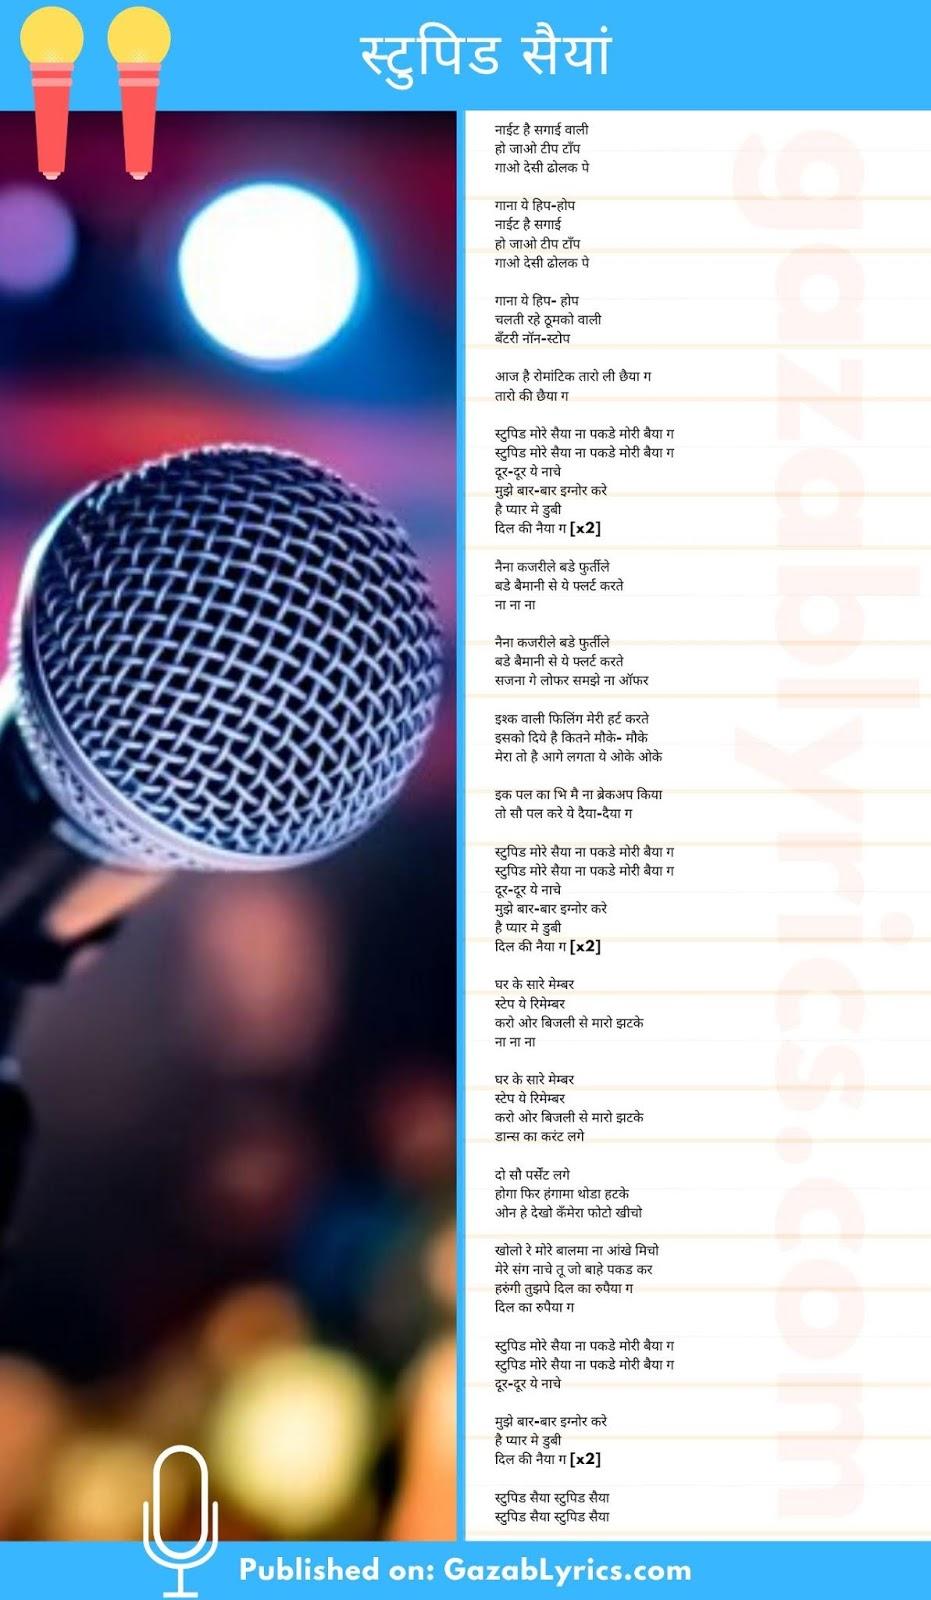 Stupid Saiyaan song lyrics image